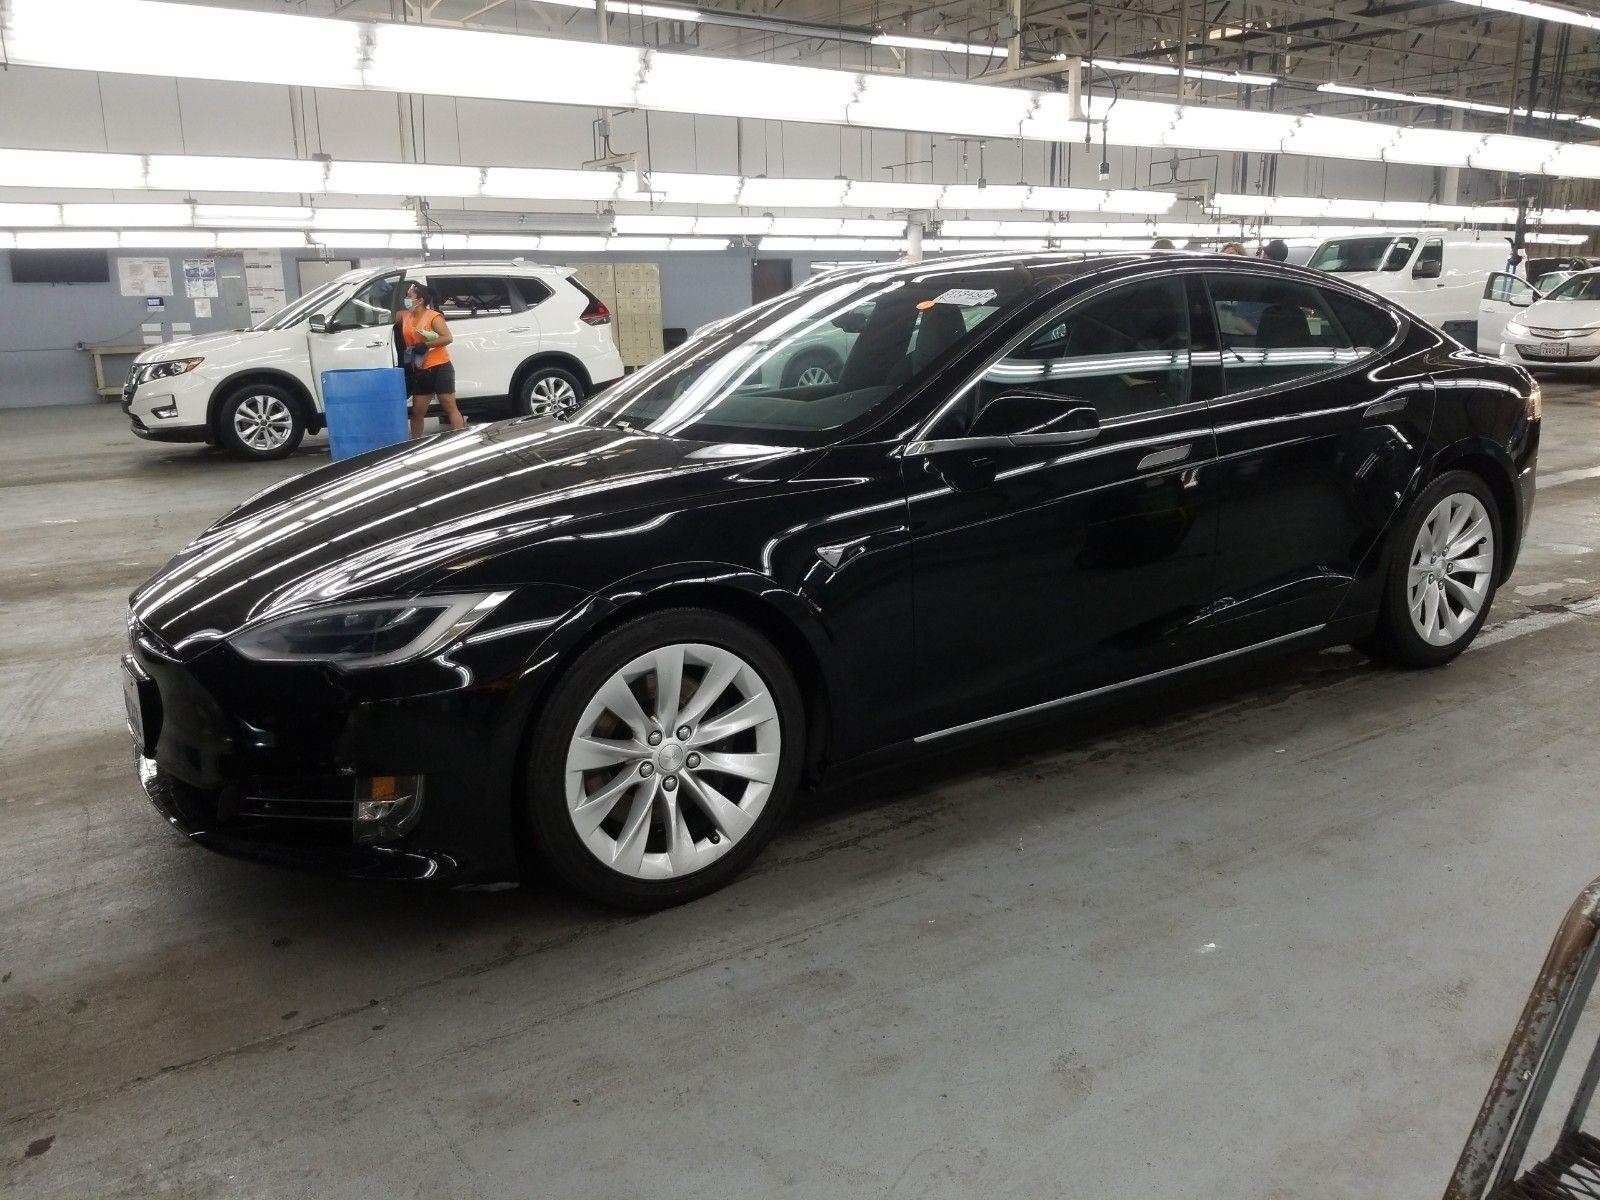 2018 Tesla Model s . Lot 99913867818 Vin 5YJSA1E29JF293647